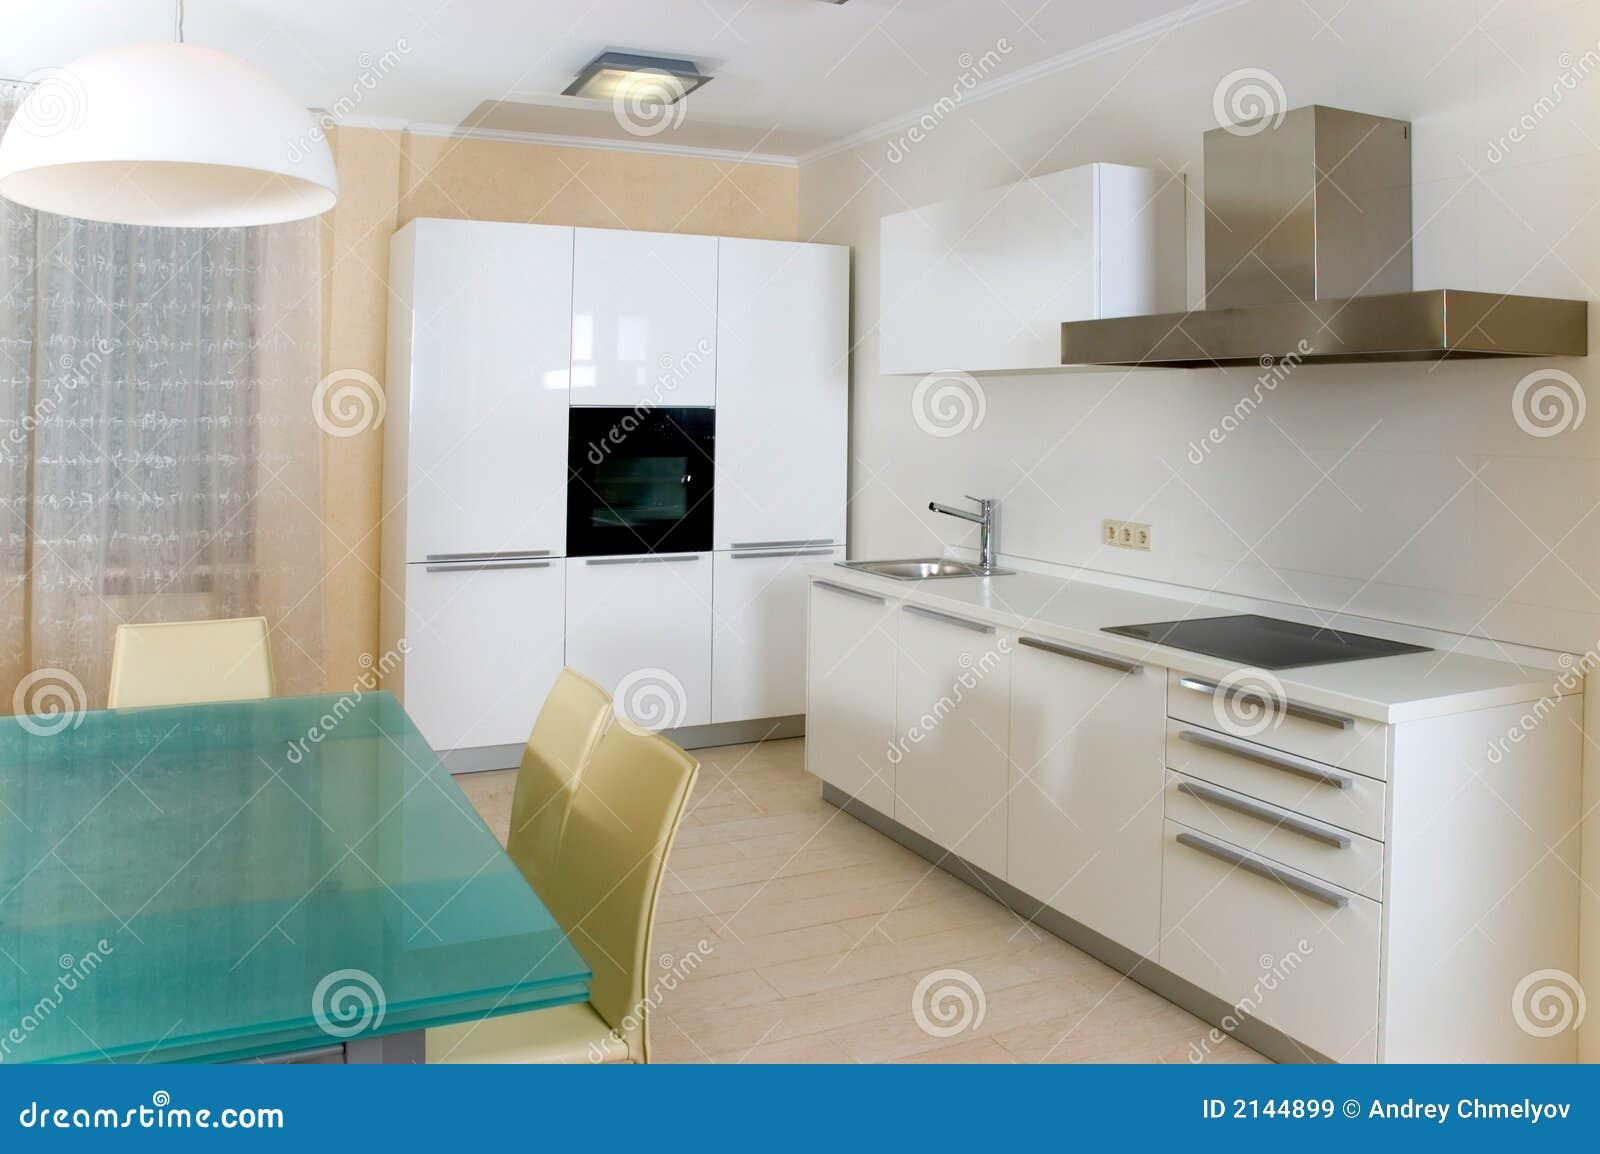 Moderne Keuken Pinterest : Keuken on Pinterest Google, Met and ...